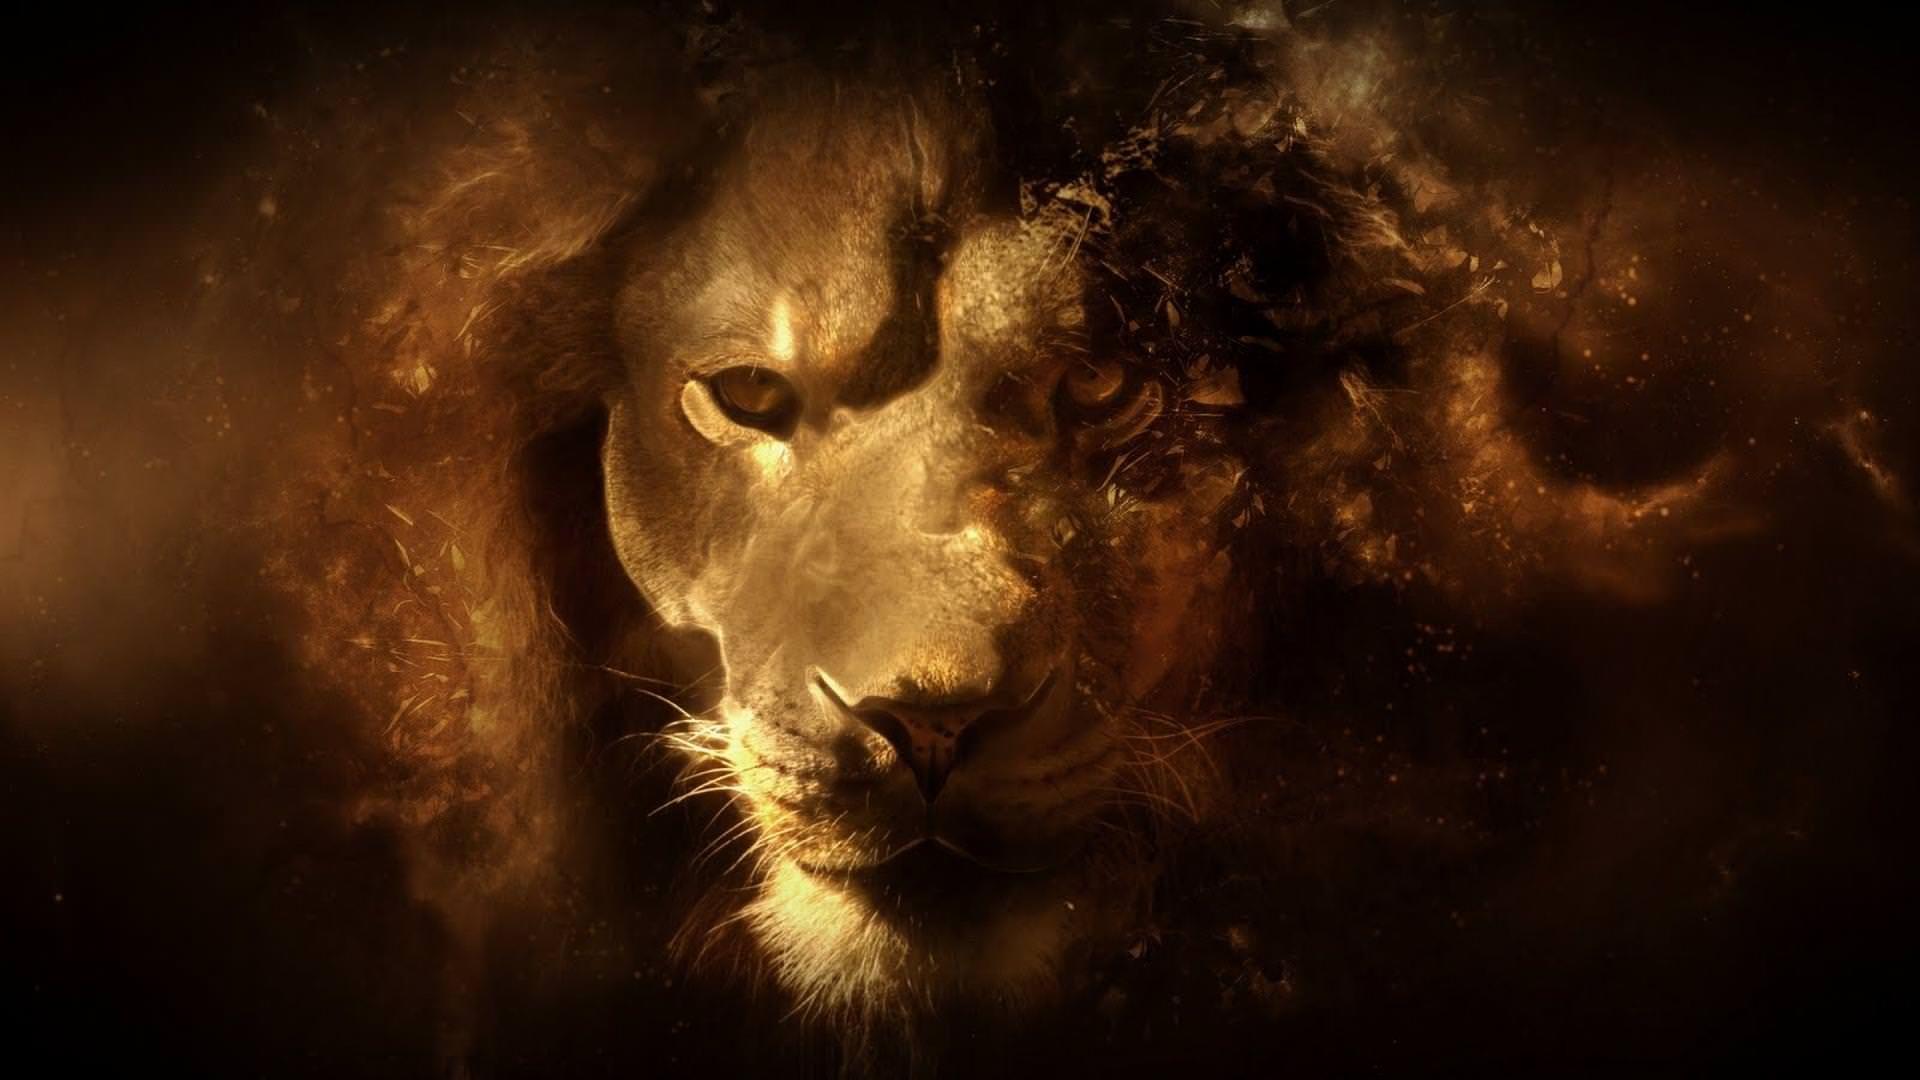 3d Lion 1920x1080 Lion Hd Wallpaper Lion Wallpaper Abstract Lion